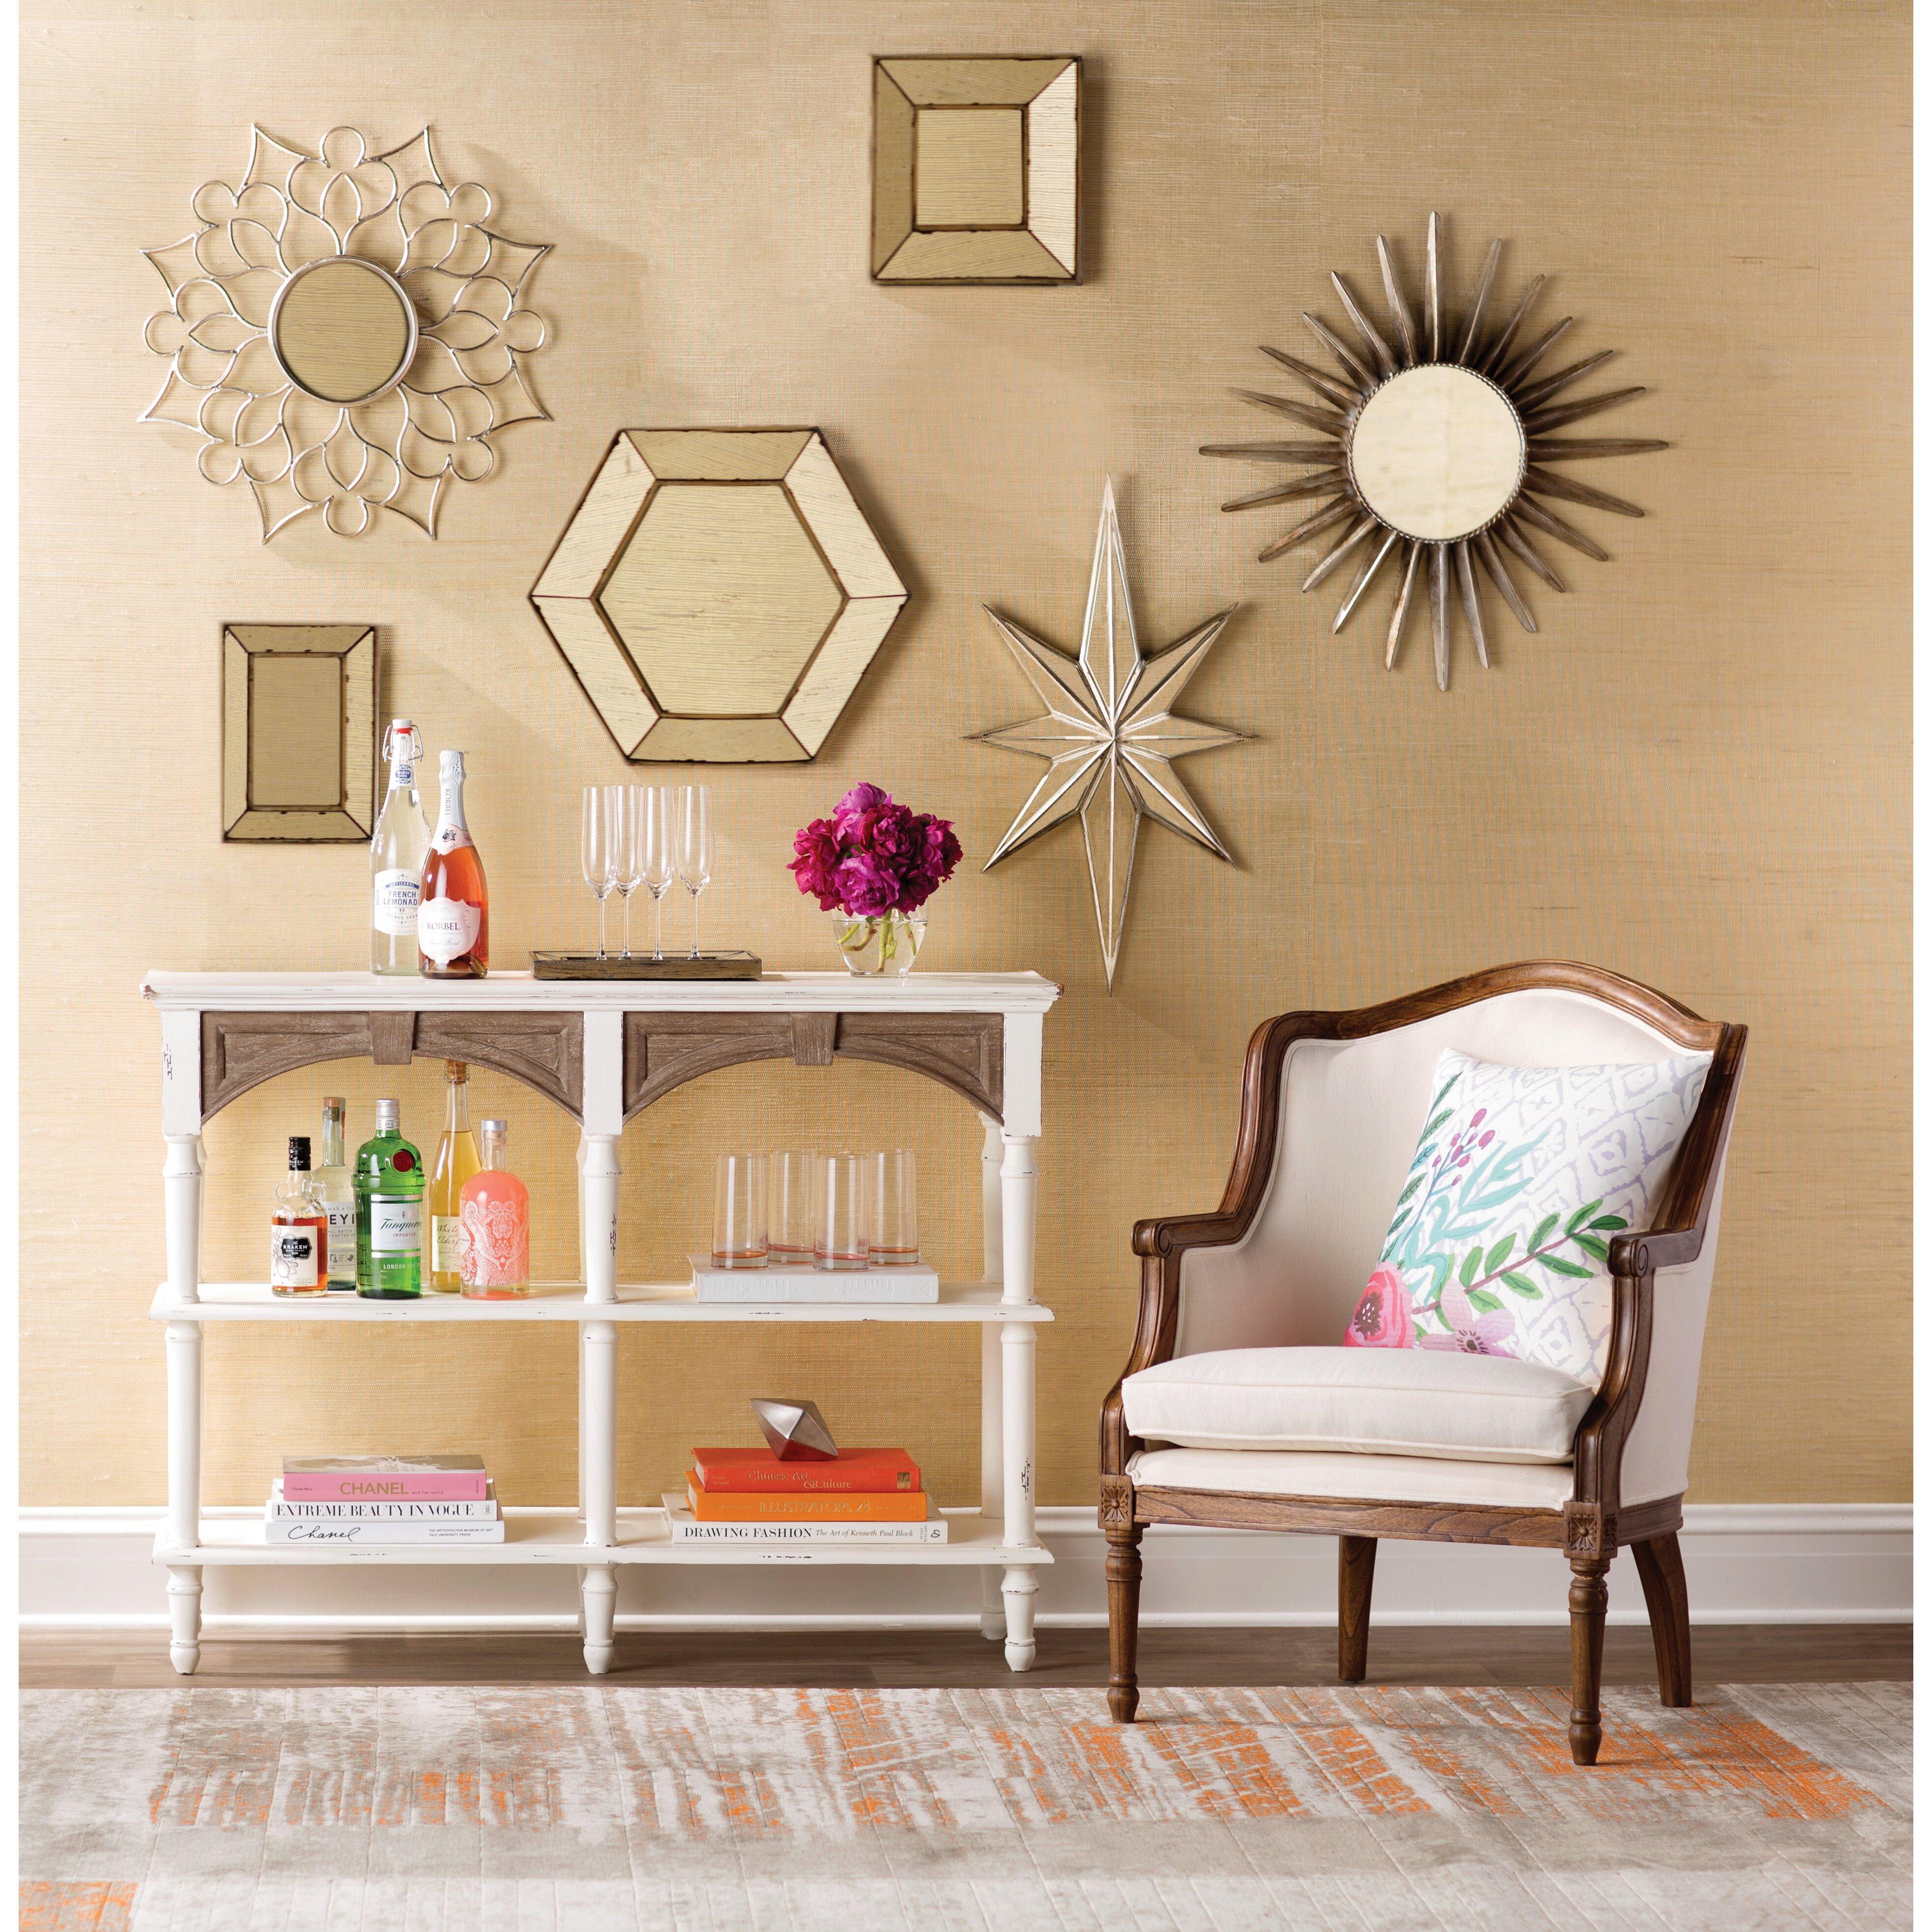 Stratton Home Decor Charlotte Wall Mirror & Reviews | Wayfair